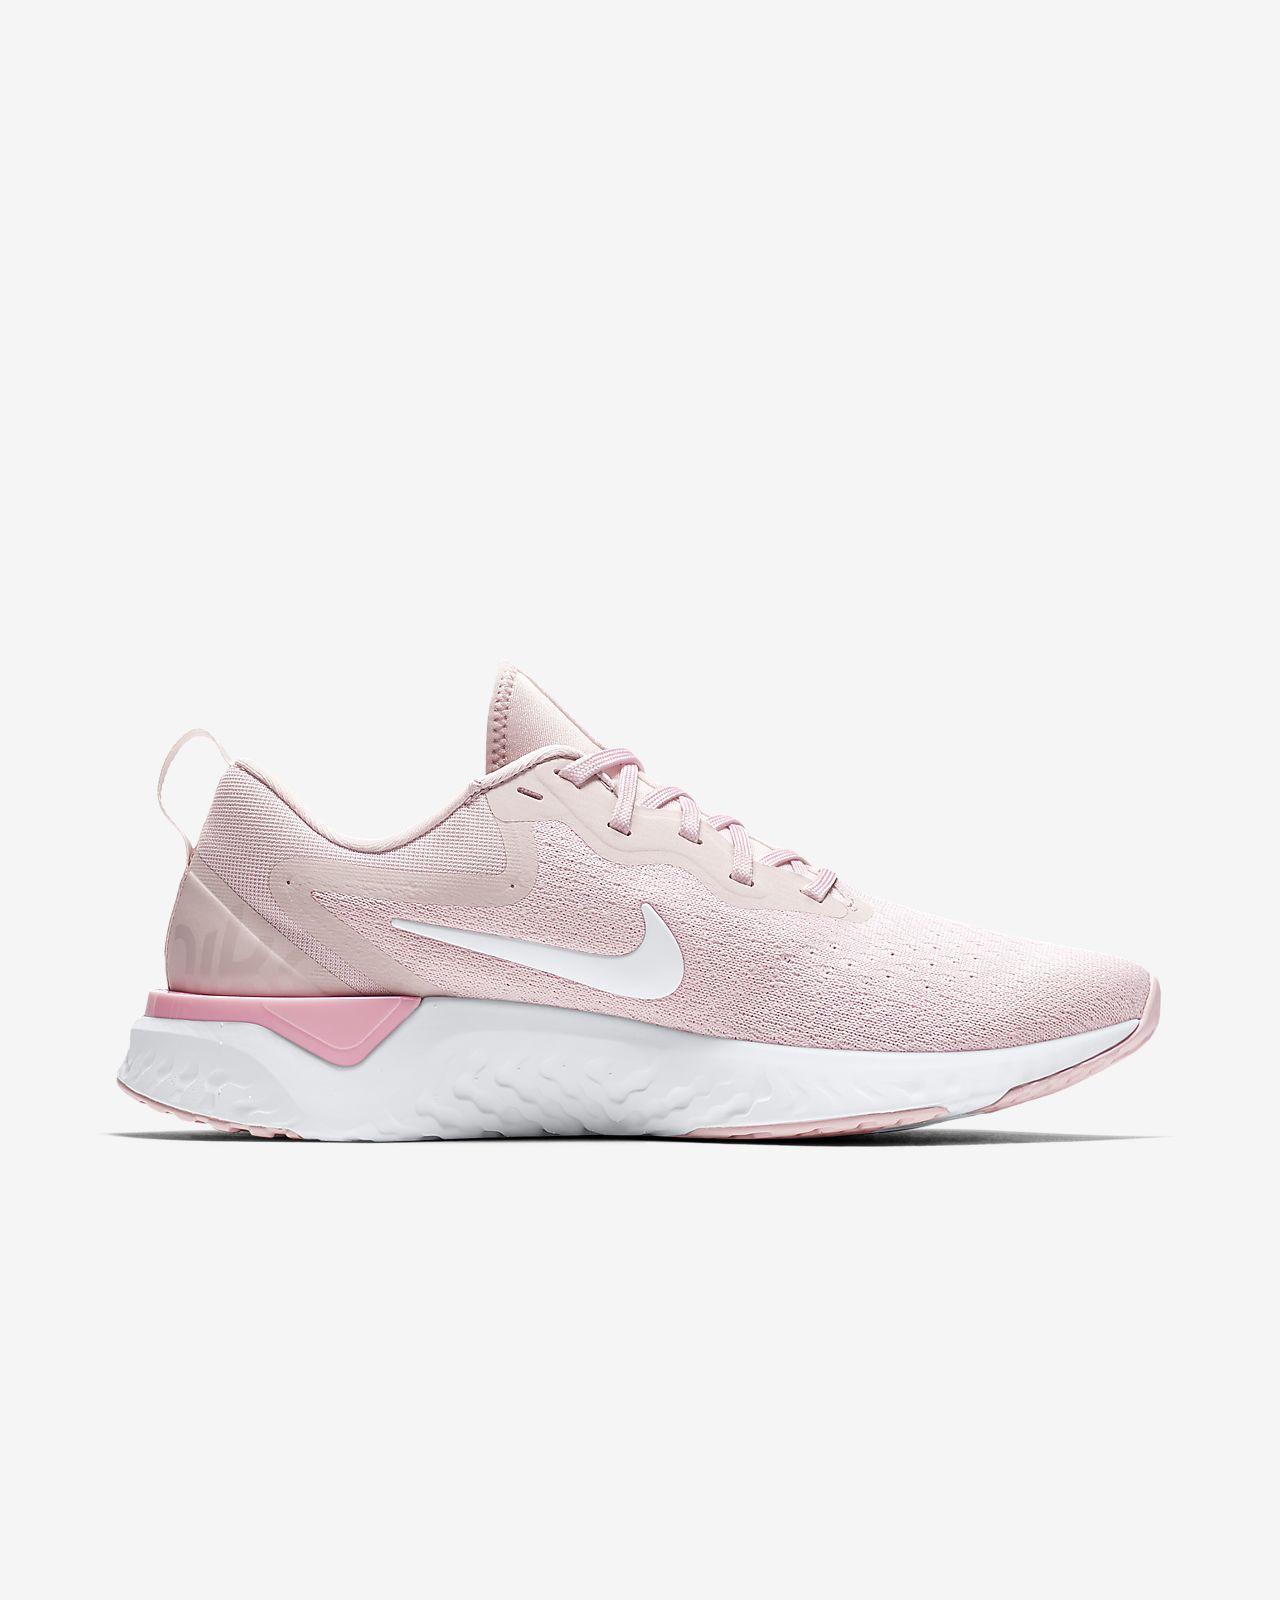 hot sale online a9ca8 c9450 ... Nike Odyssey React Women s Running Shoe